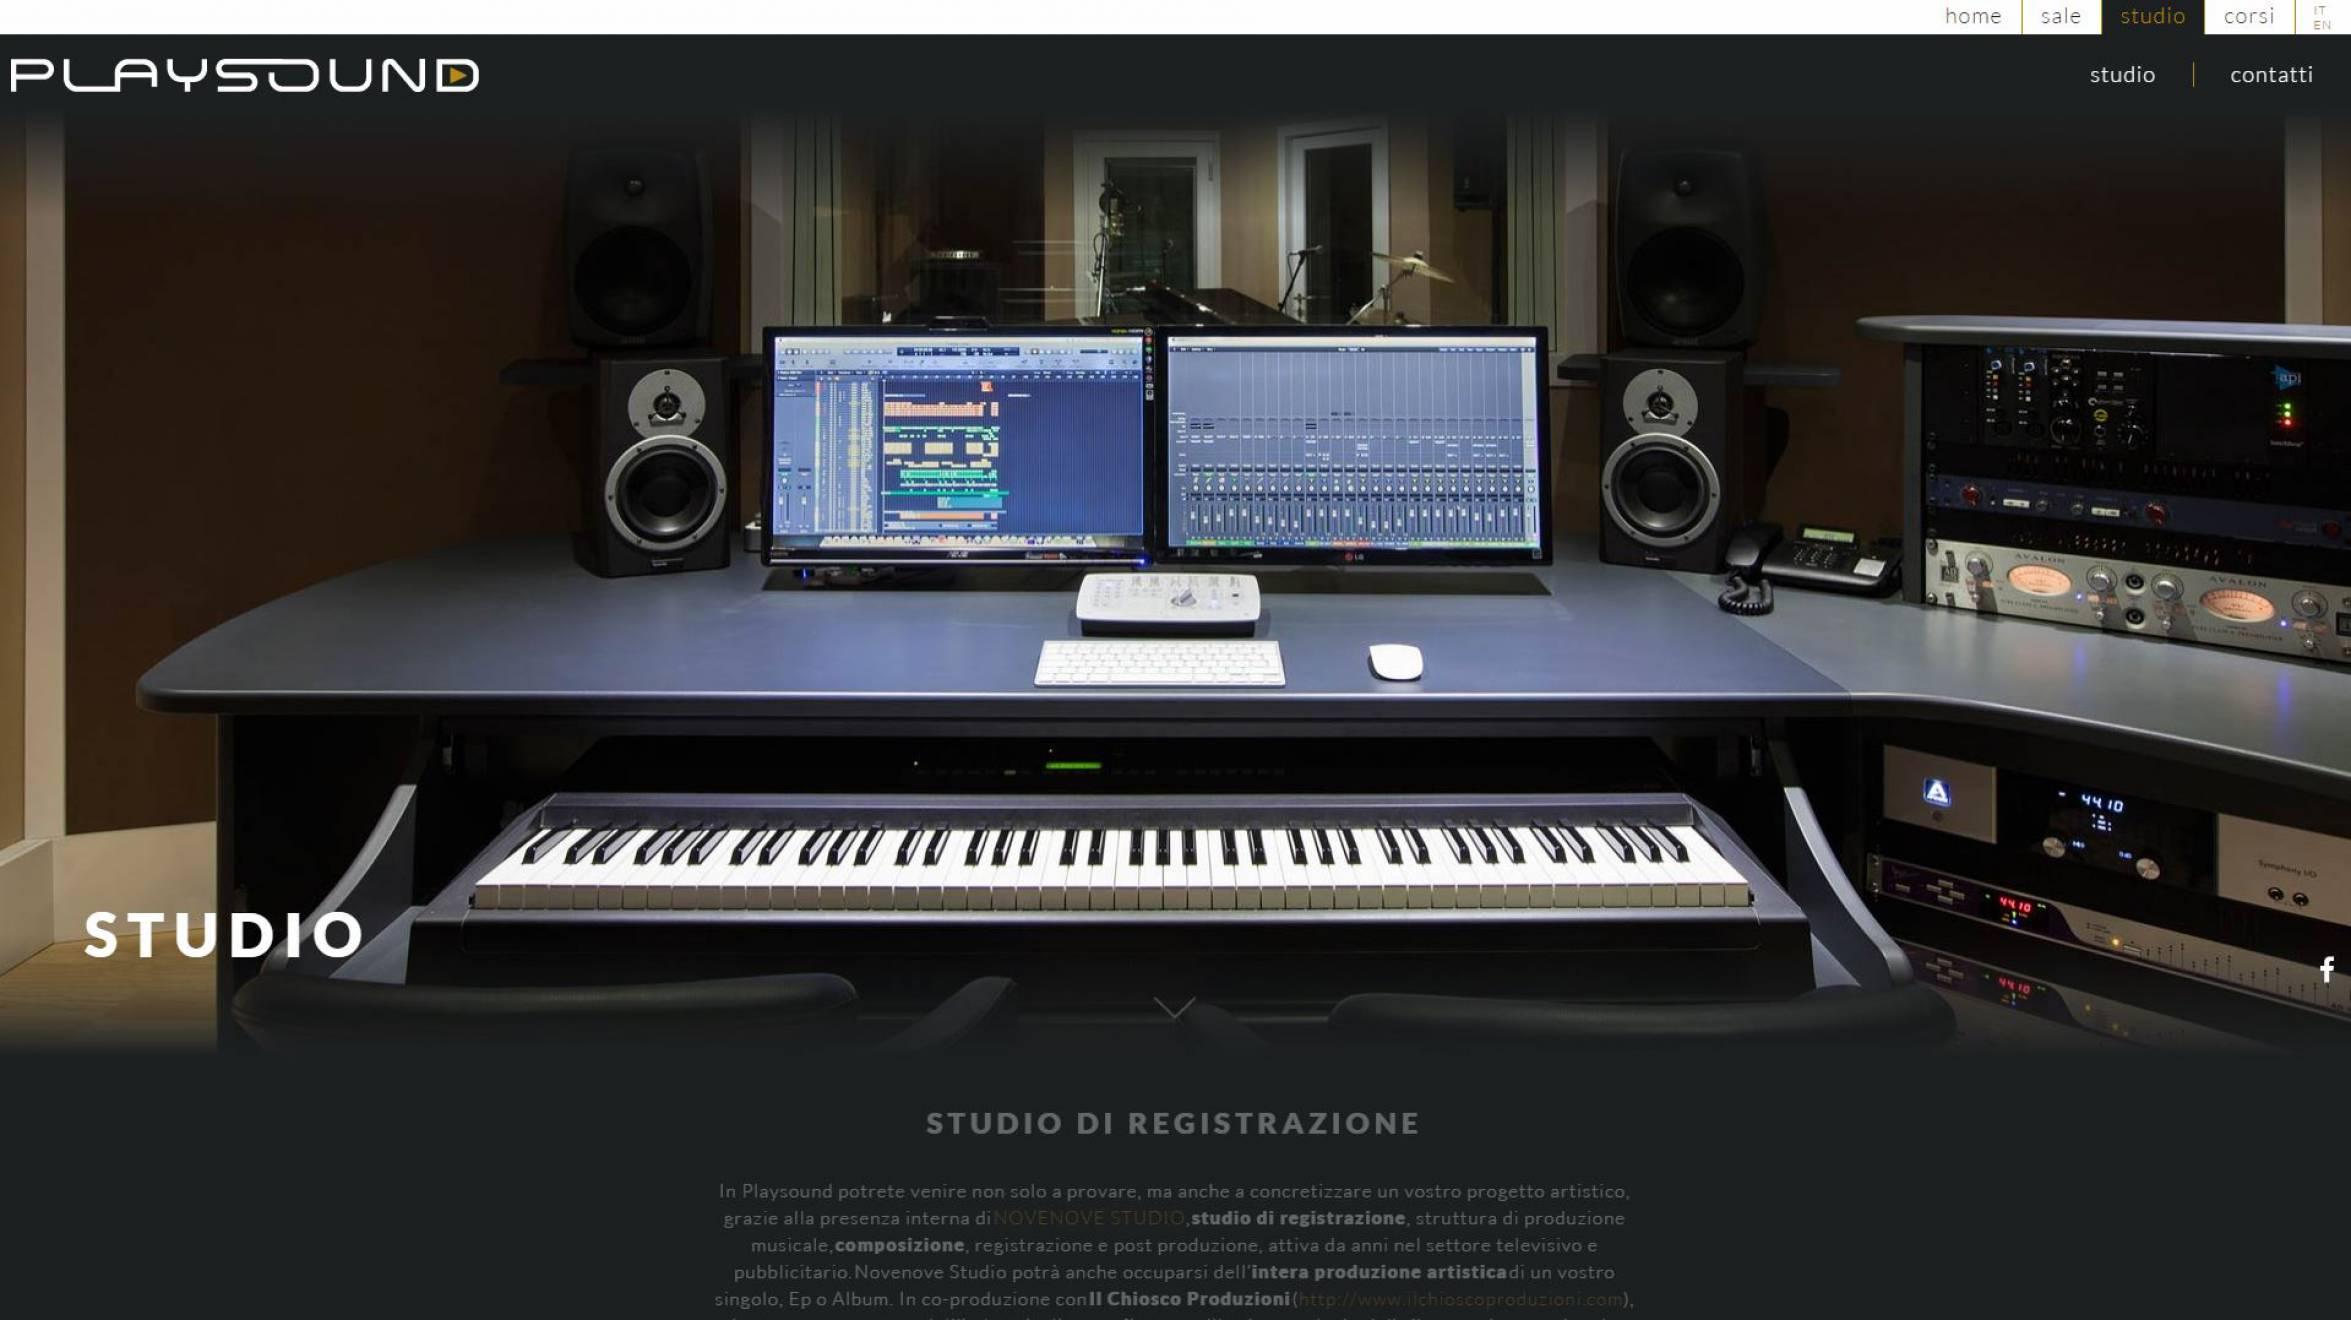 Studio Playsound sito internet